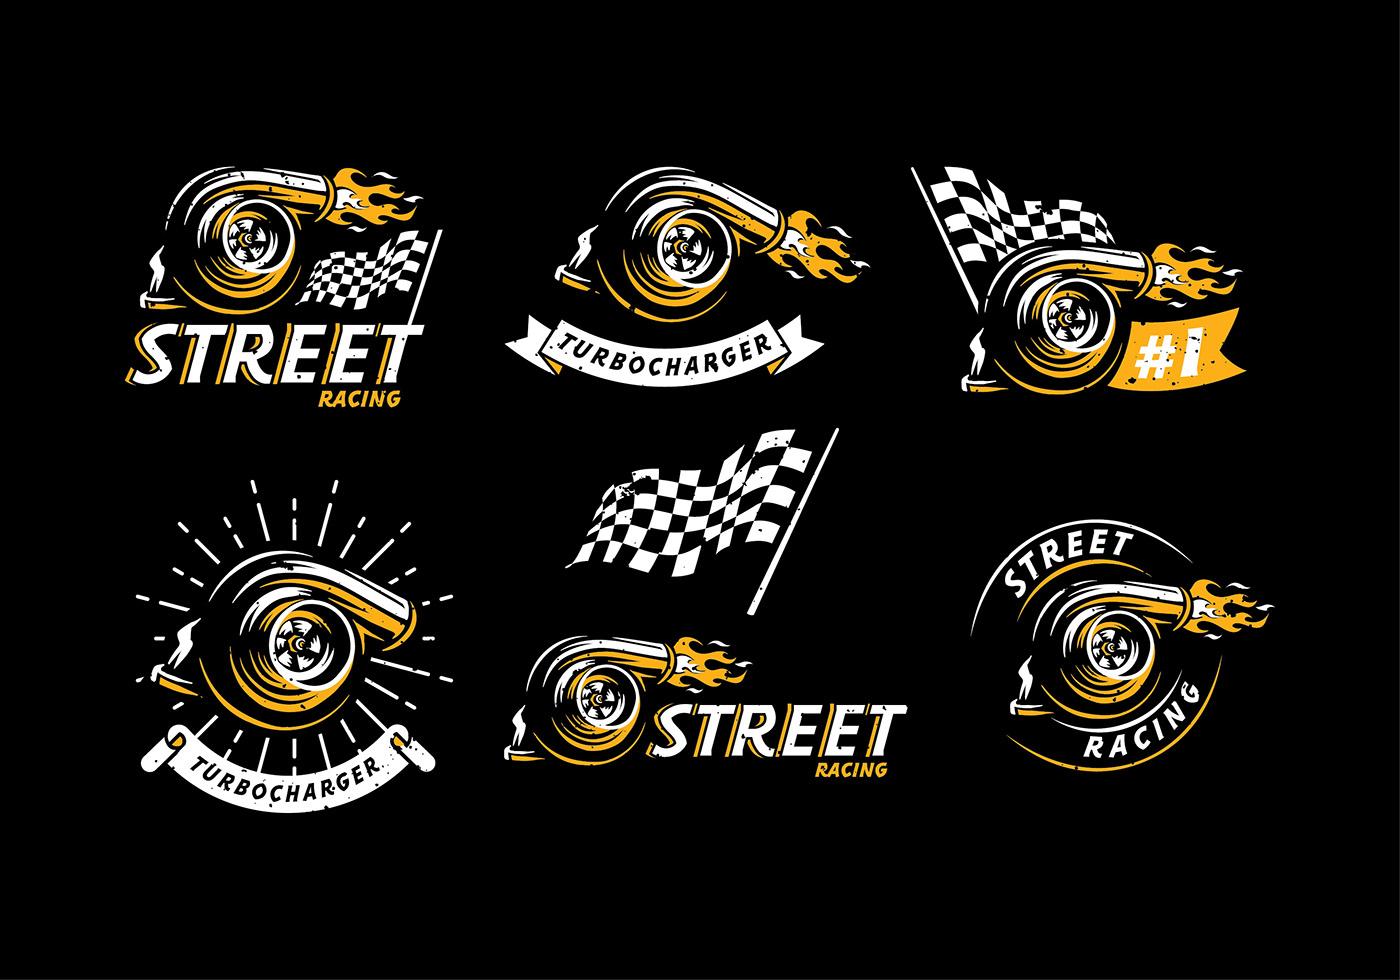 Turbocharger Logo Free Vector on Vector Download » Car Engine Piston Illustration